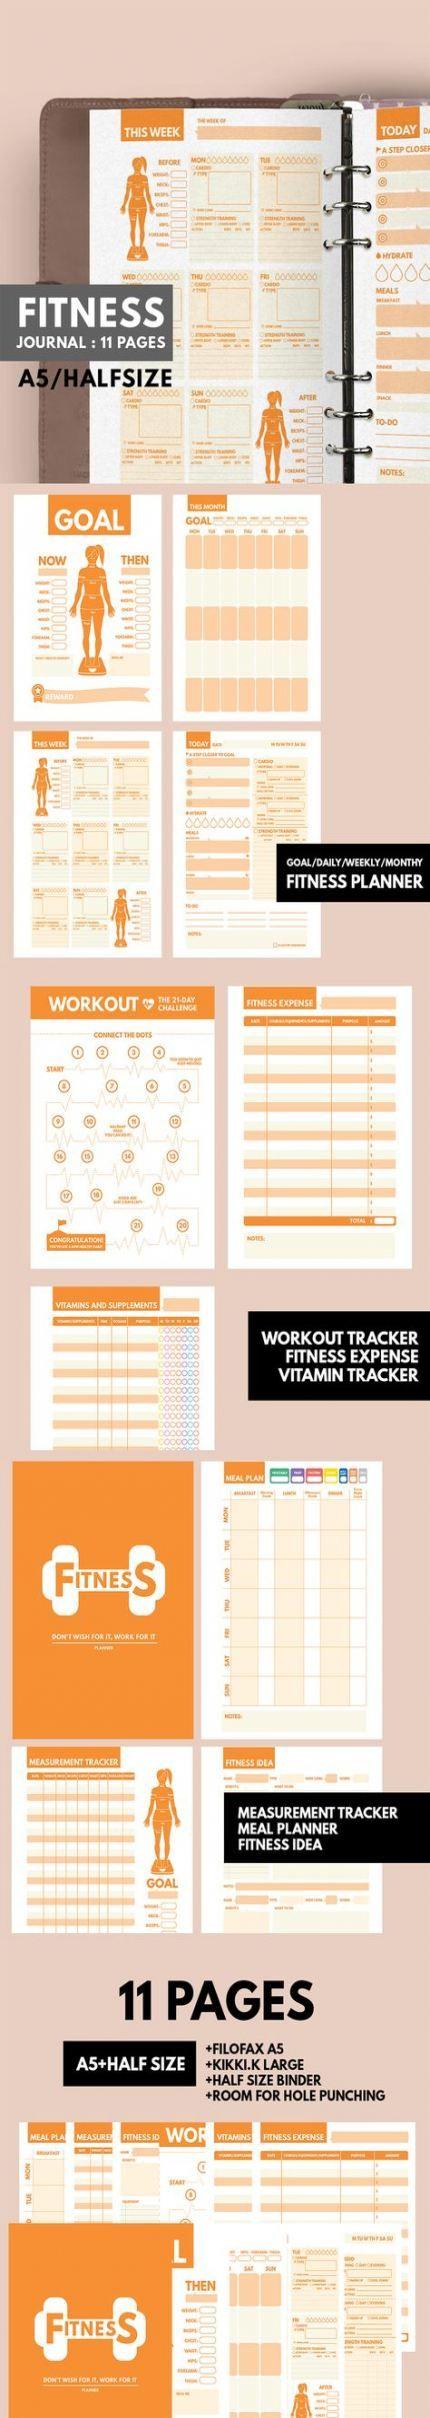 Fitness Planner Printable Etsy 16+ Ideas #fitness